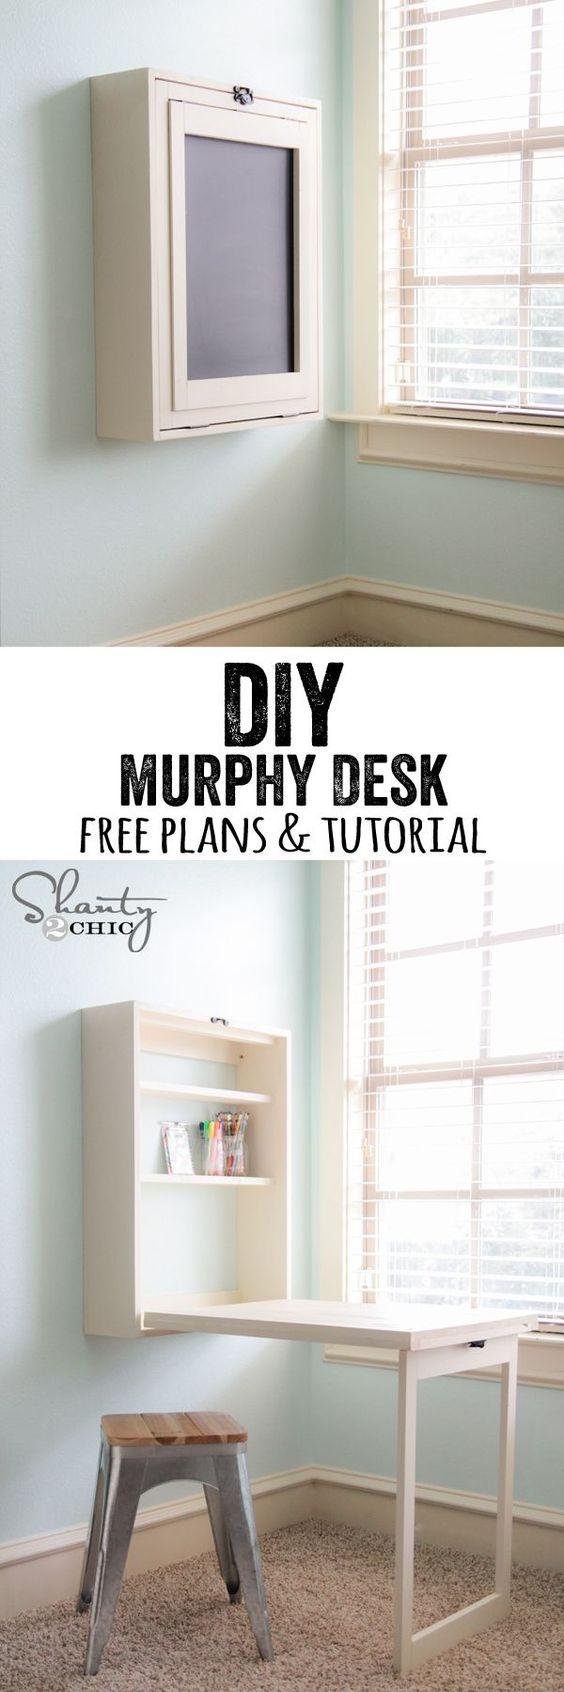 Diy murphy desk diy computer desk murphy desk and diy desk for How to organize your desk diy